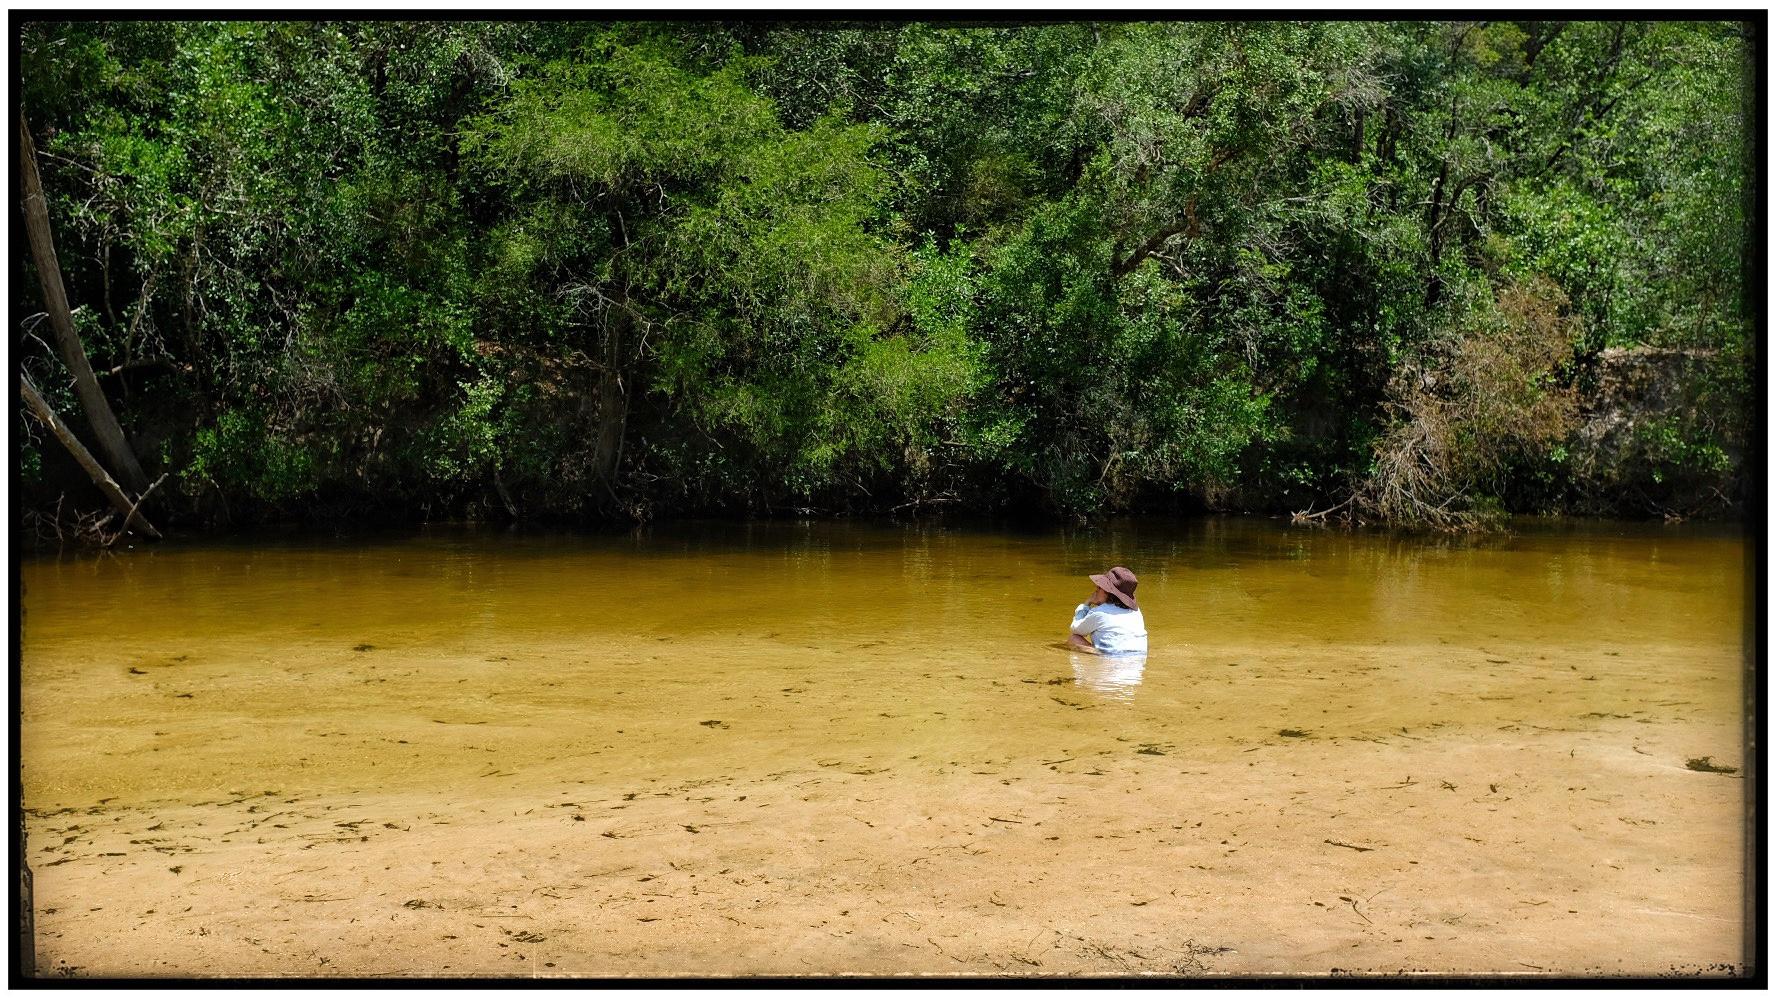 Coldwater creek in NWFlorida